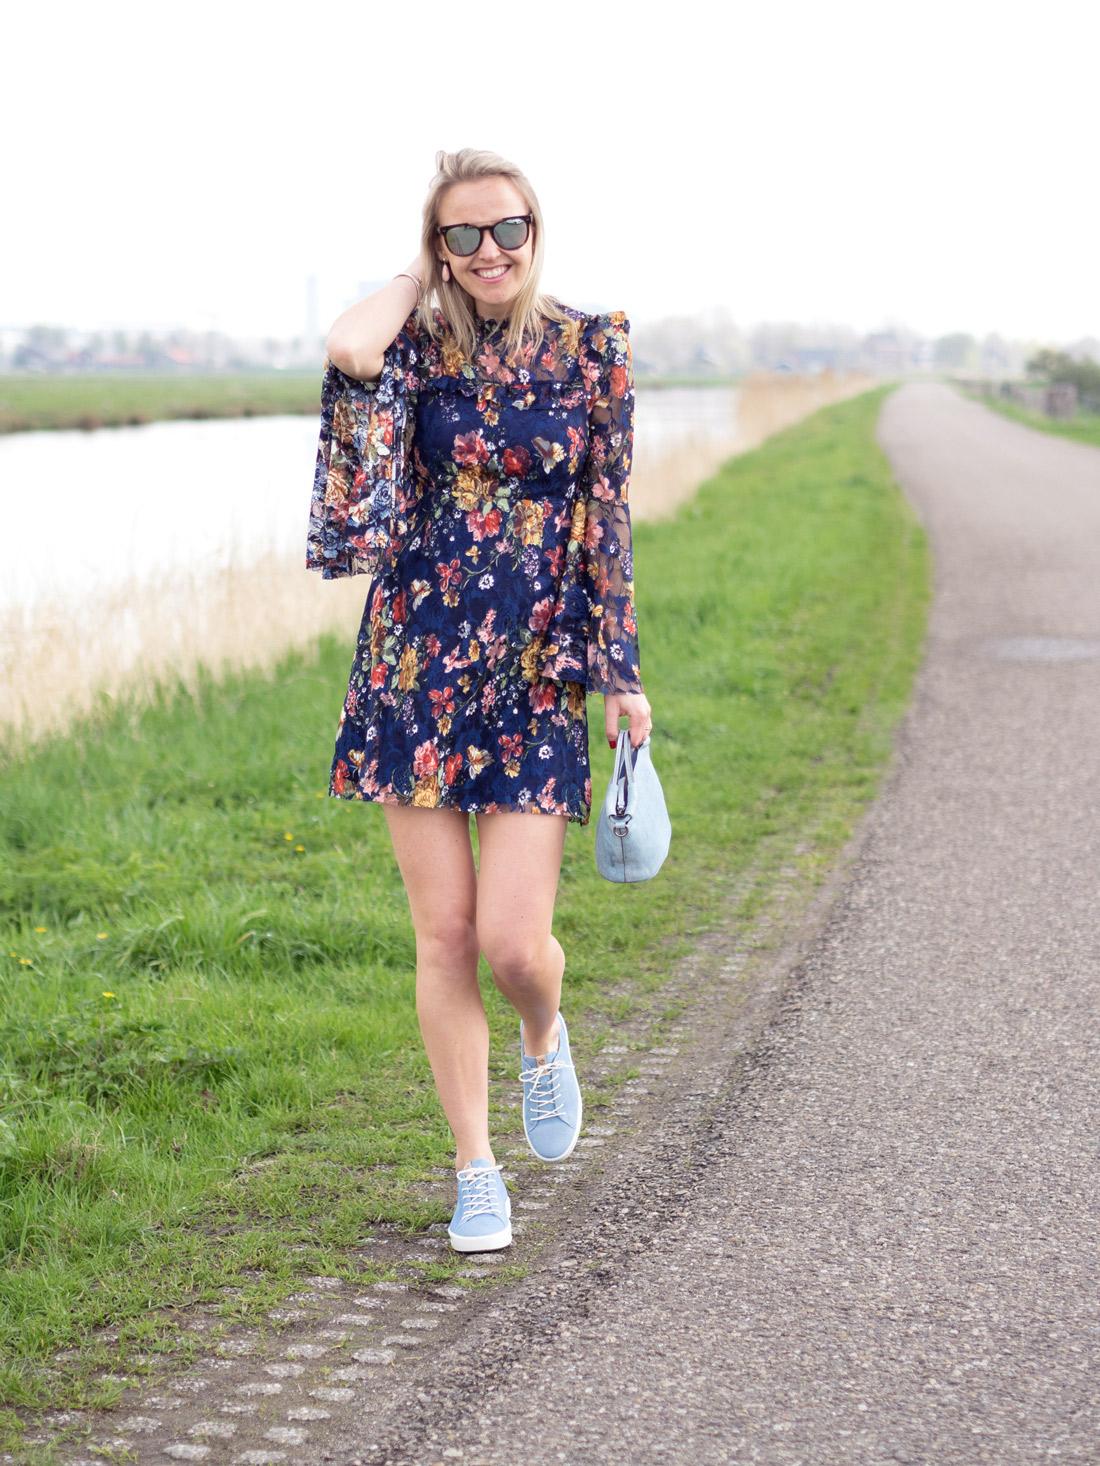 BAG-AT-YOU_Susanne_Bavinck_Bender_Blogger_Fashion_Amsterdam_By_Marinke_Davelaar---Ecco-True-Indigo-Collection